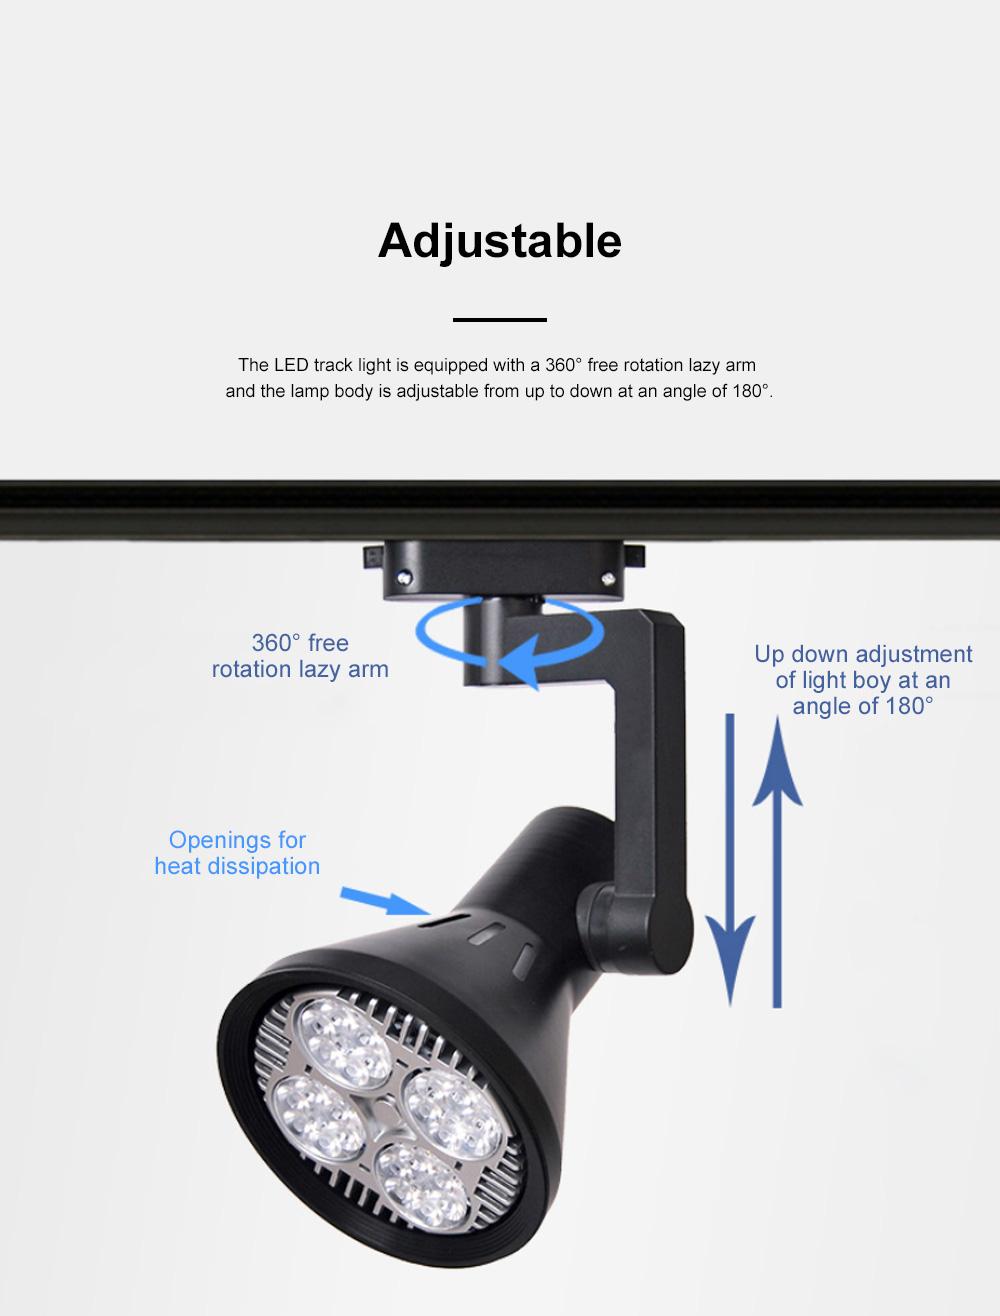 PAR30 Ultra-bright LED Track Lighting for Clothing Store Art Gallery Warm Light LED Track Lamp Free Rotation Lazy Arm Tracking Spotlight 2